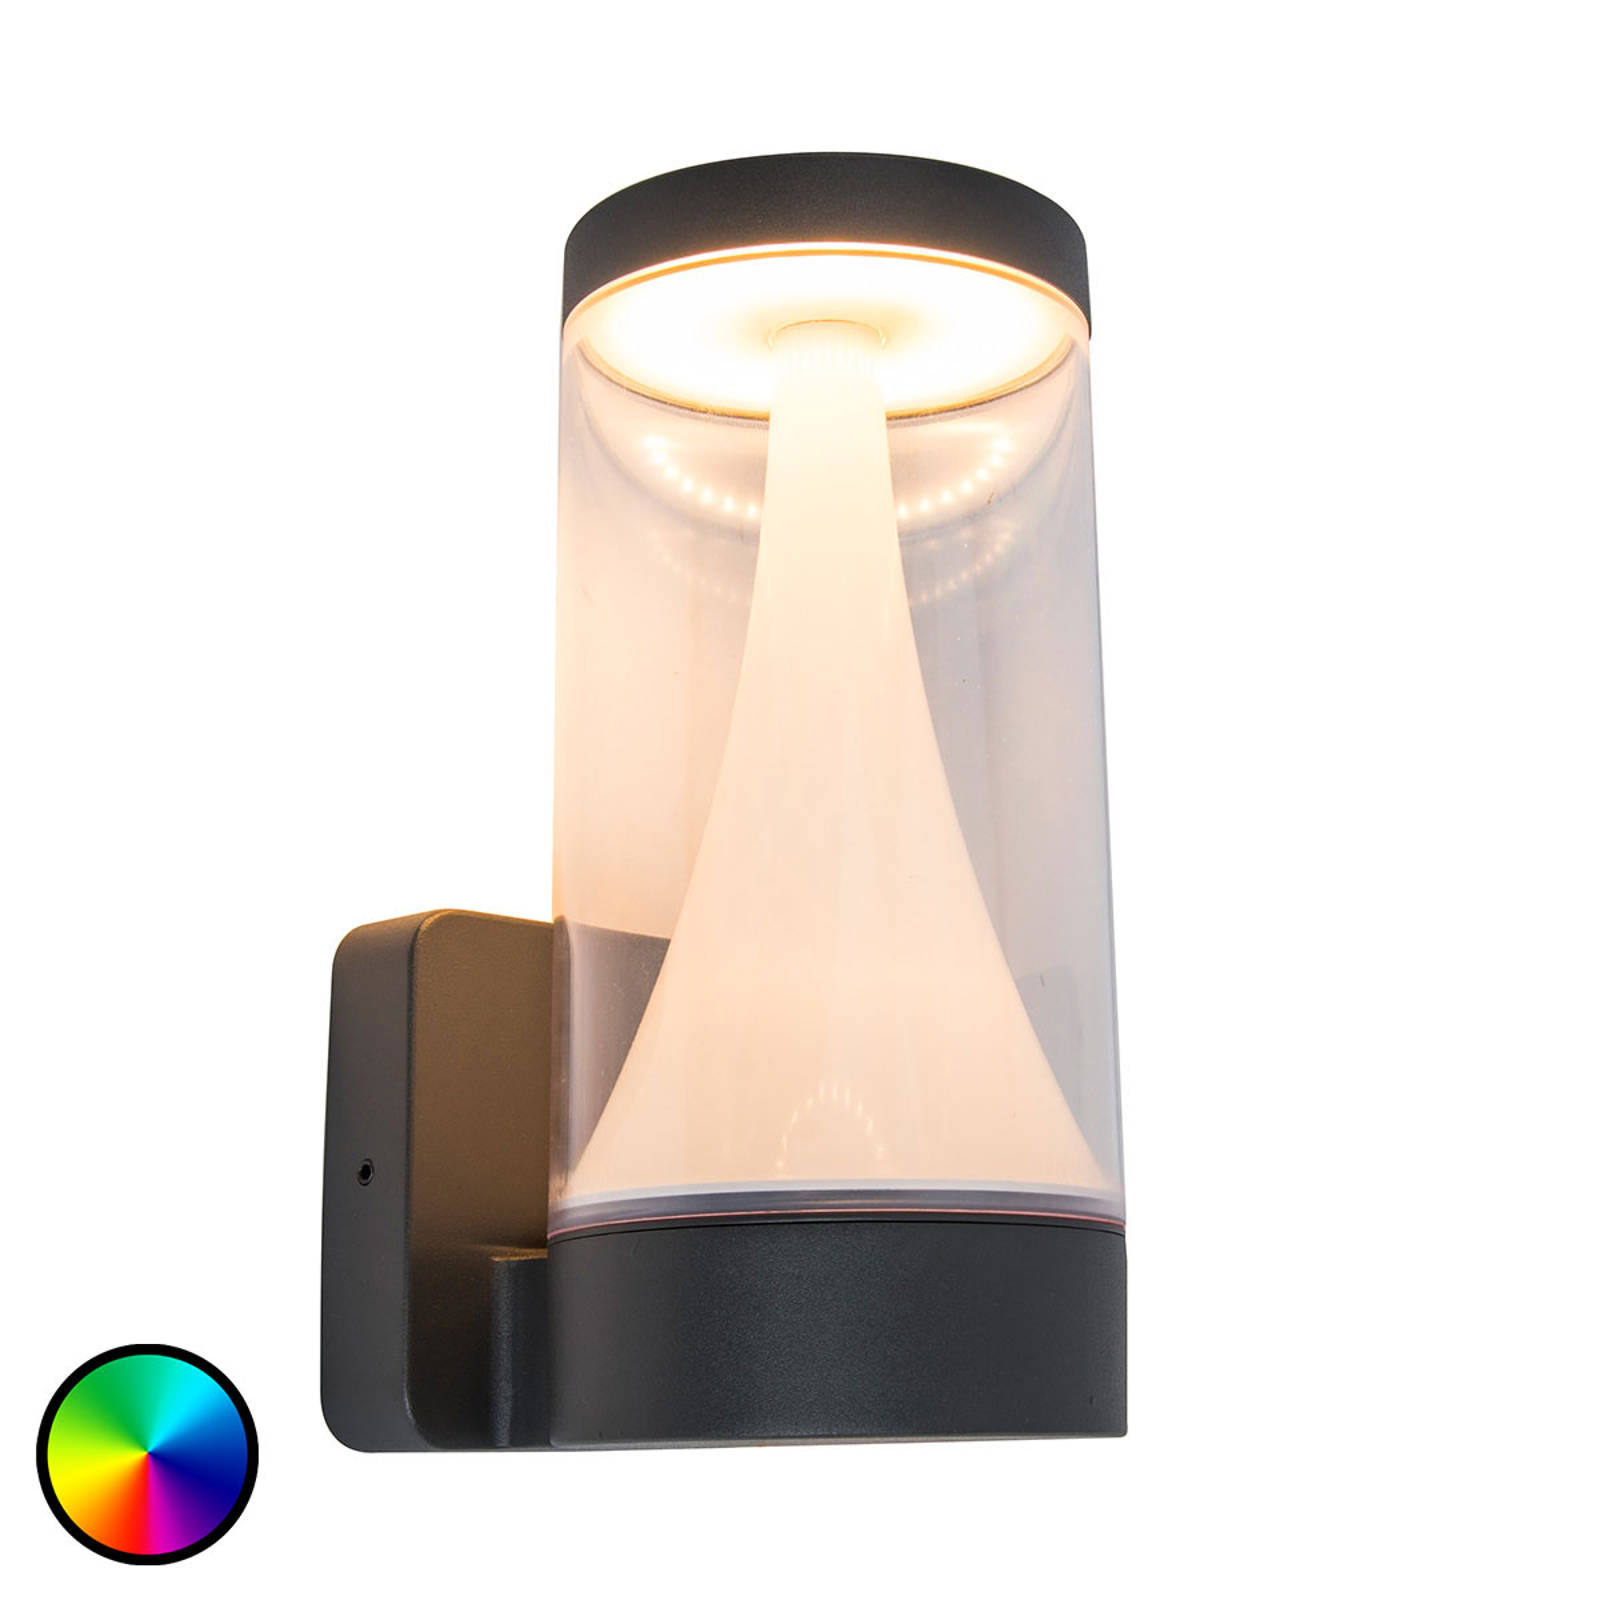 WiZ LED buitenwandlamp Spica